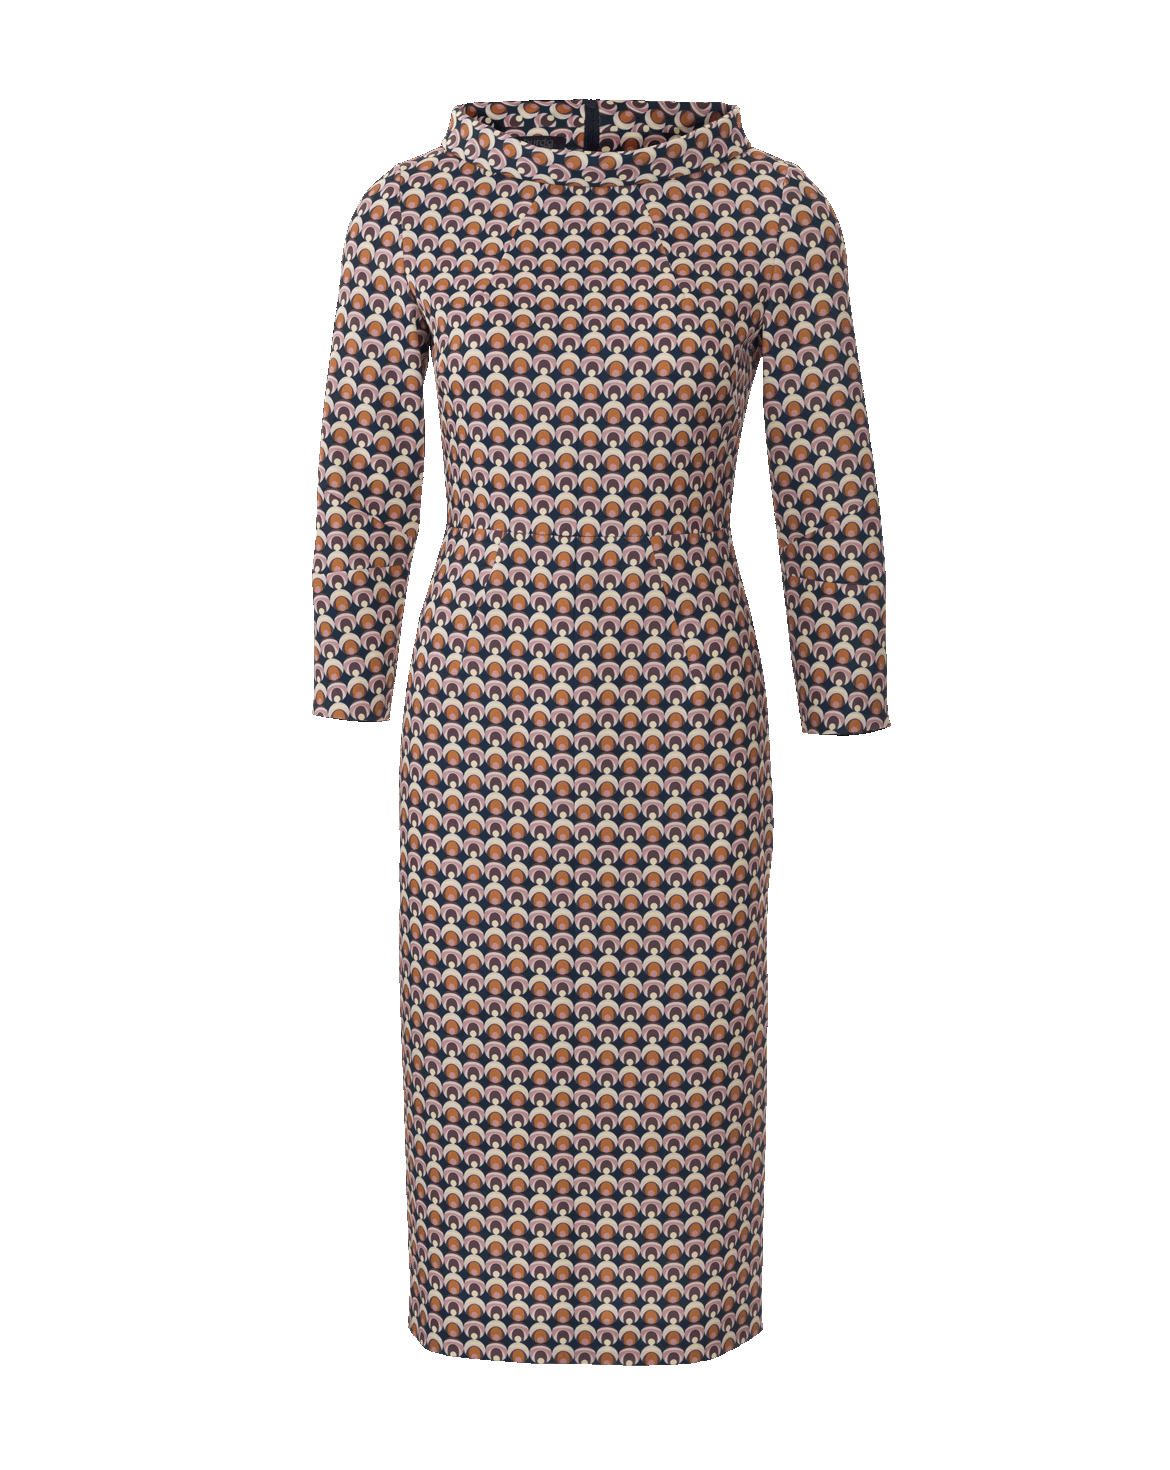 Schnittmuster Kleid 08/2017 #111A | sewing | Pinterest ...